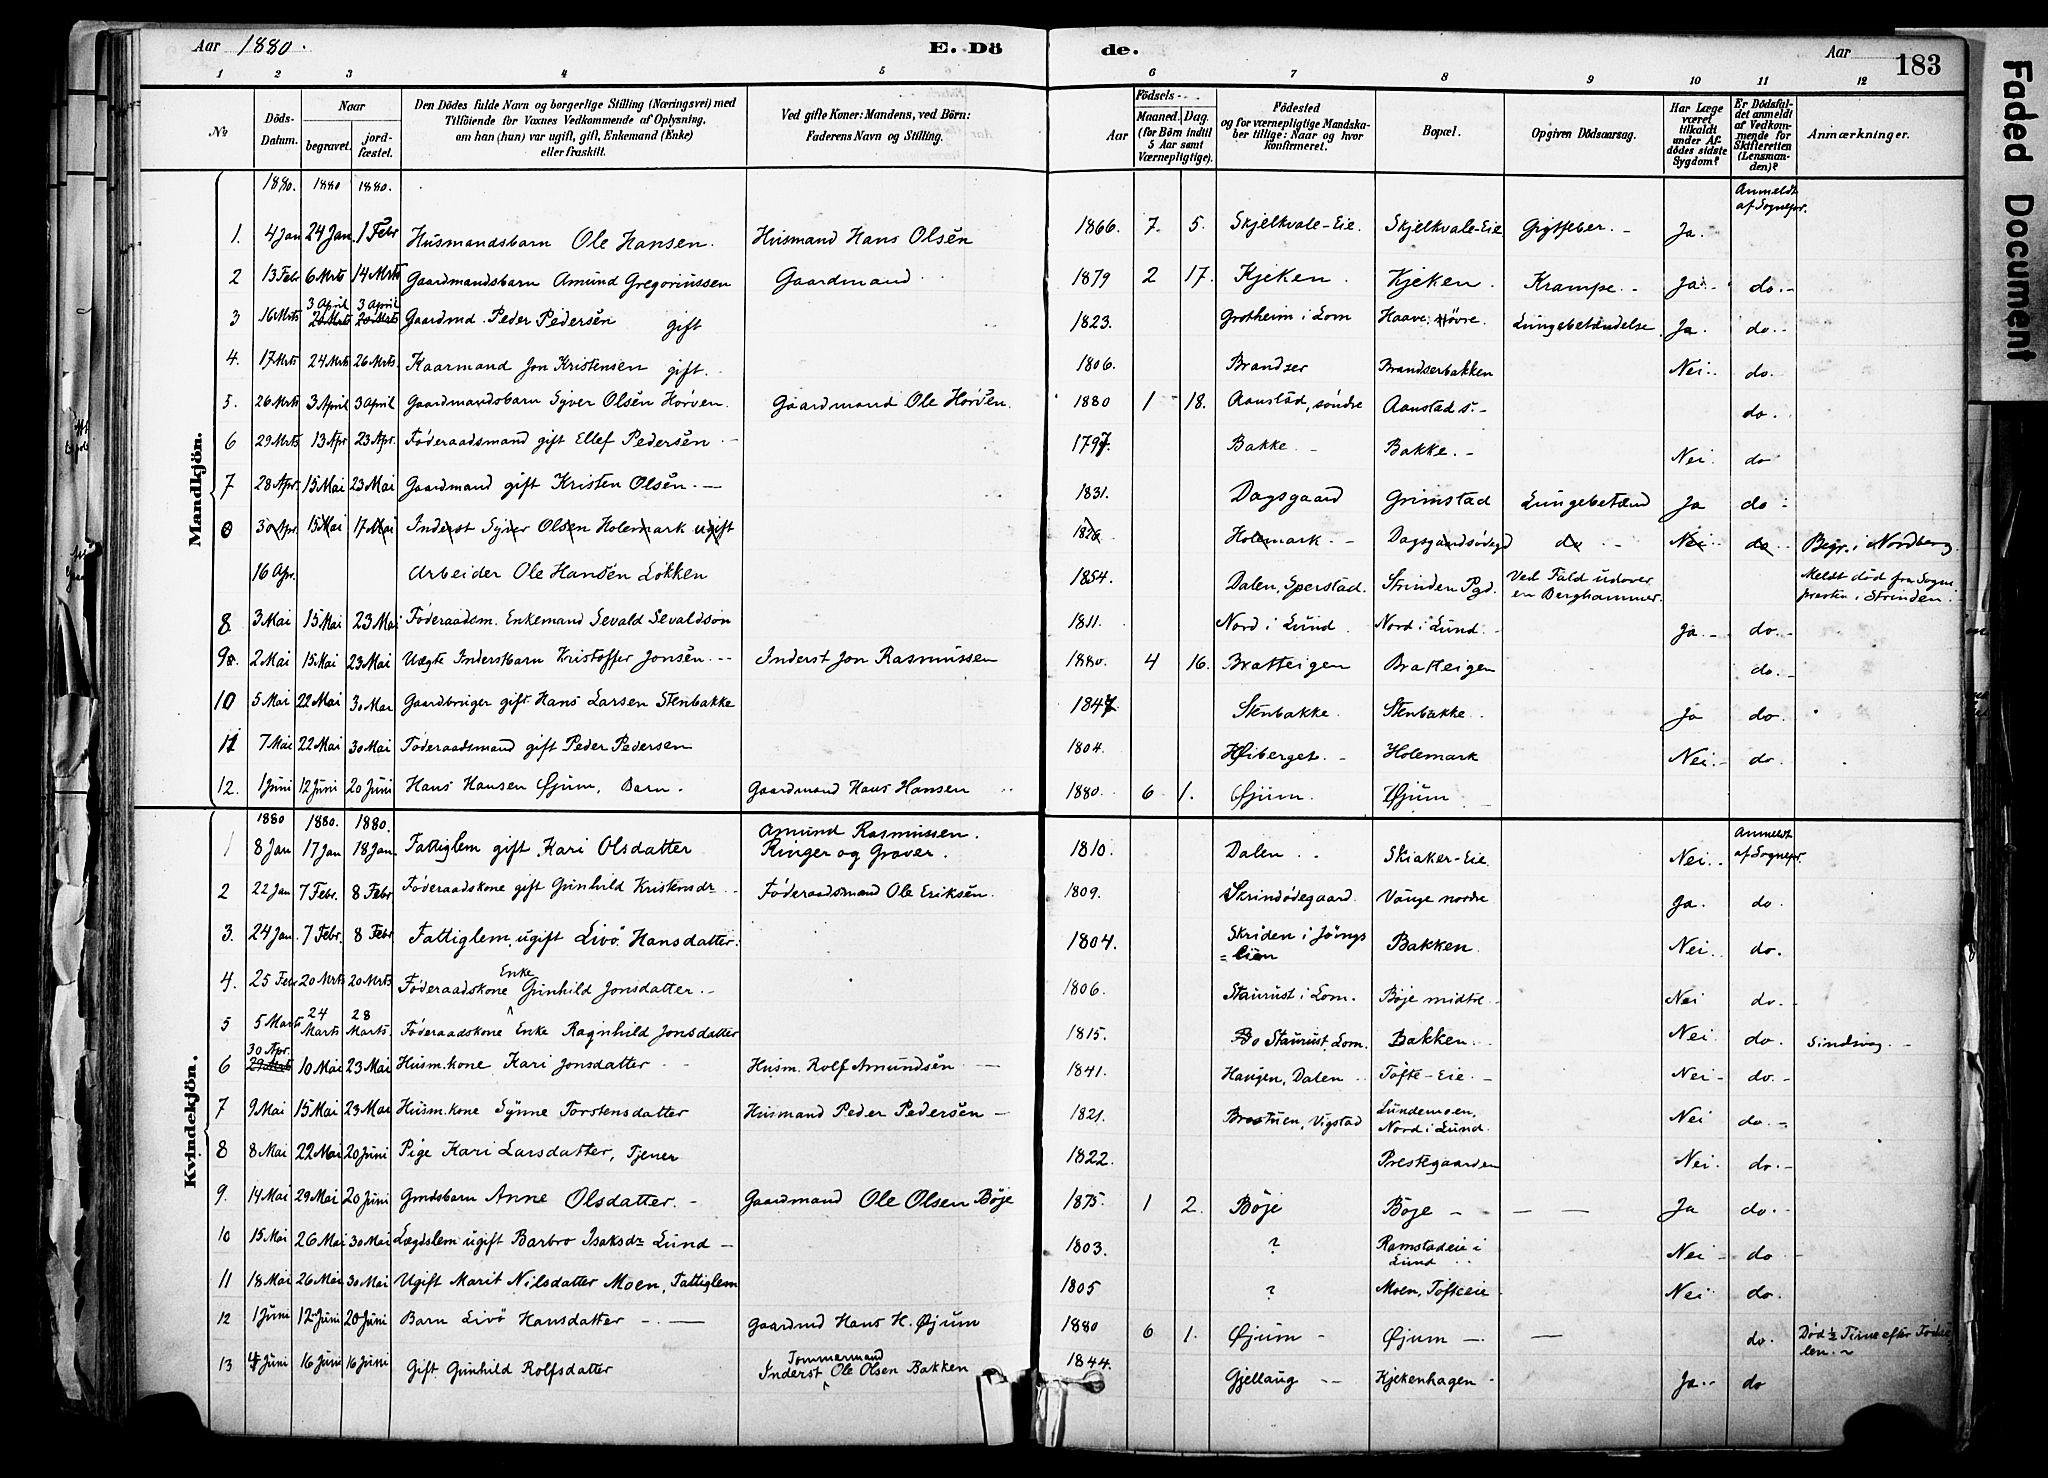 SAH, Skjåk prestekontor, Ministerialbok nr. 3, 1880-1907, s. 183